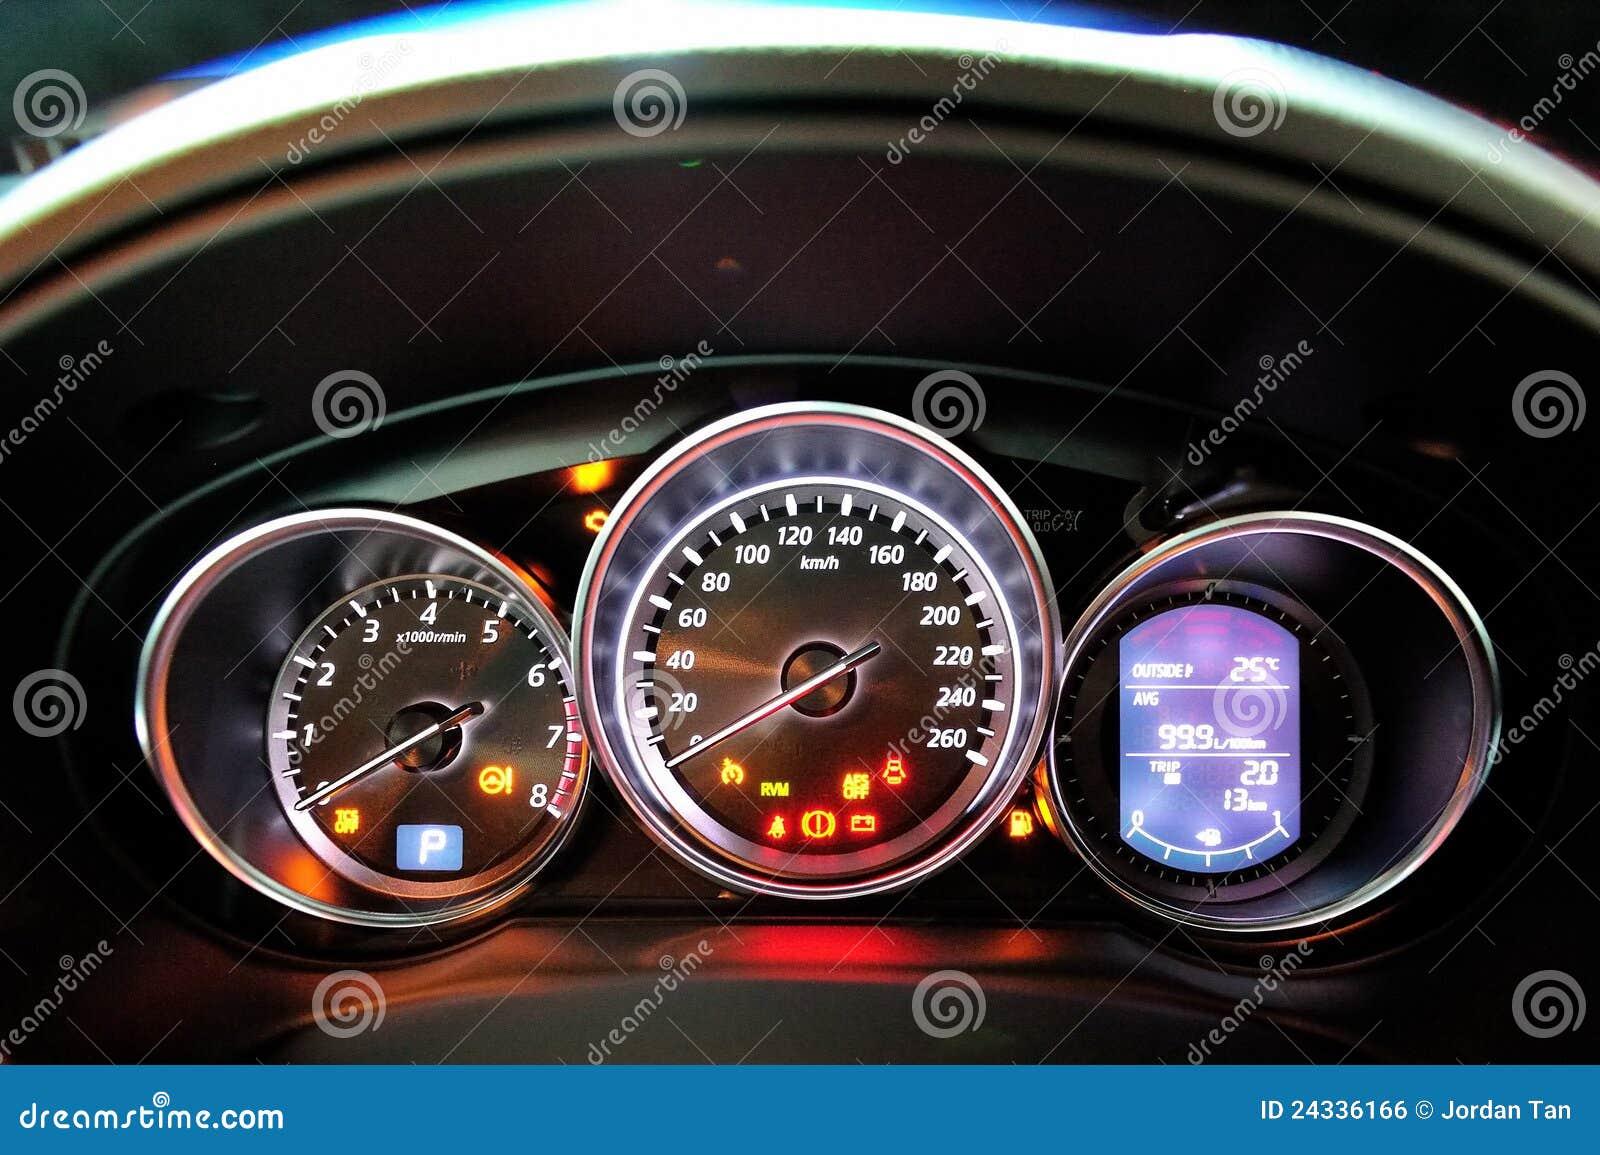 Mazda CX-5 Instrument Cluster Editorial Photo - Image: 24336166